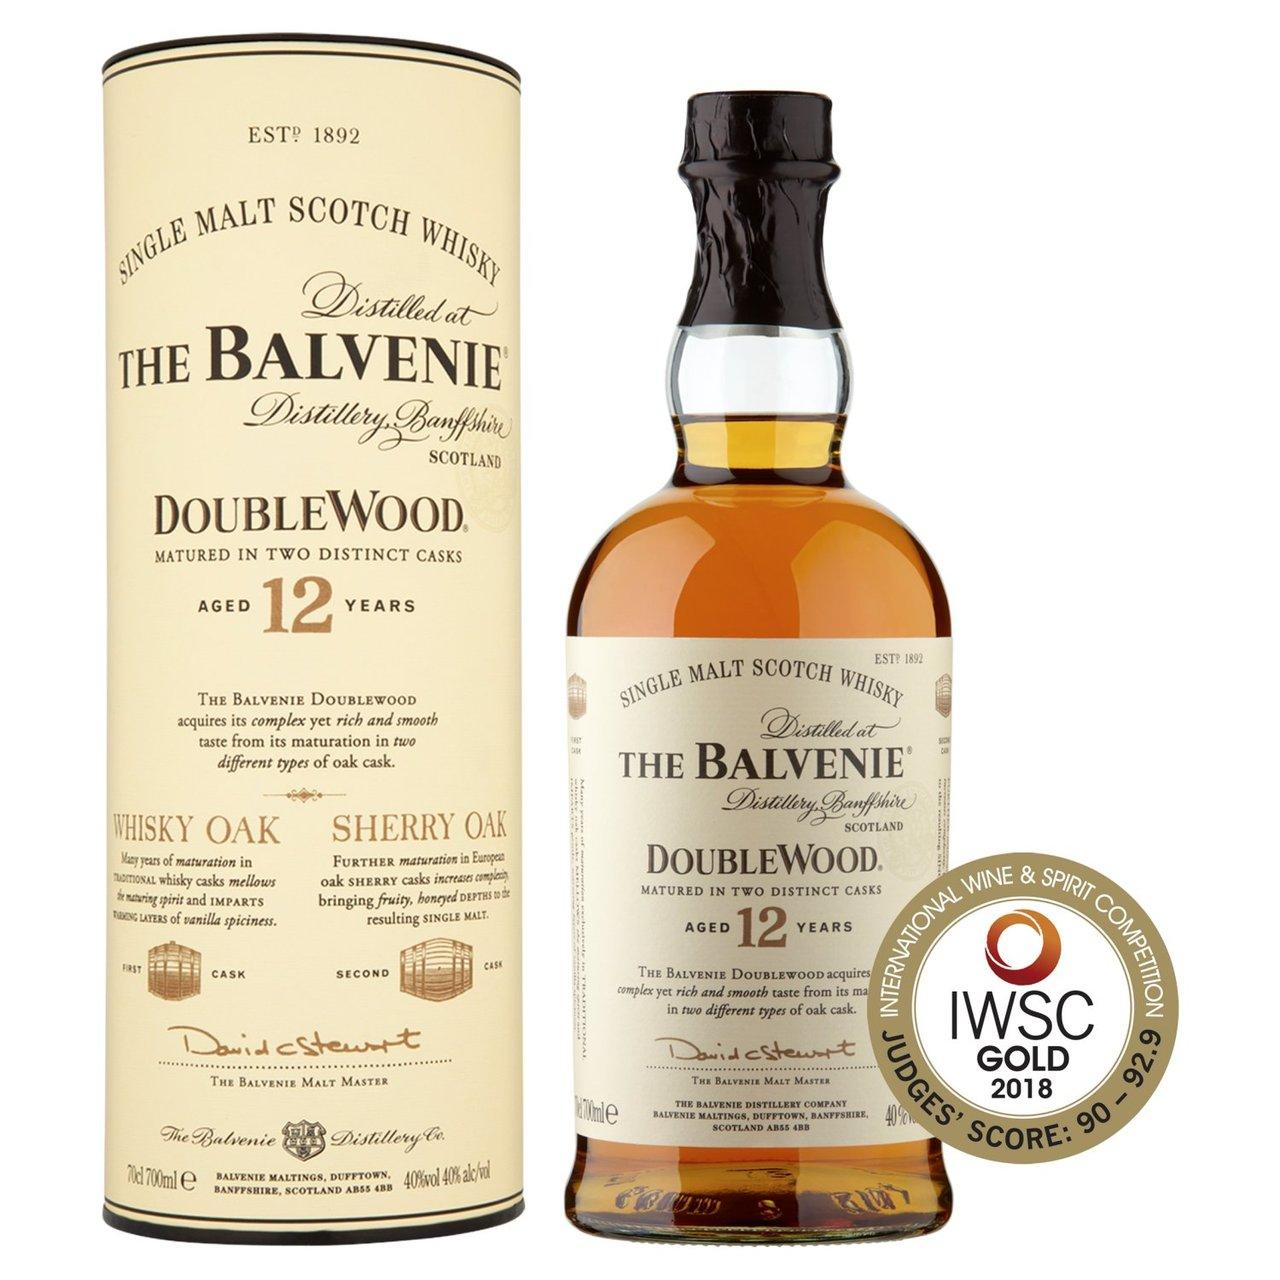 The Balvenie DoubleWood Aged 12 Years Single Malt Scotch - £32 @ Morrisons